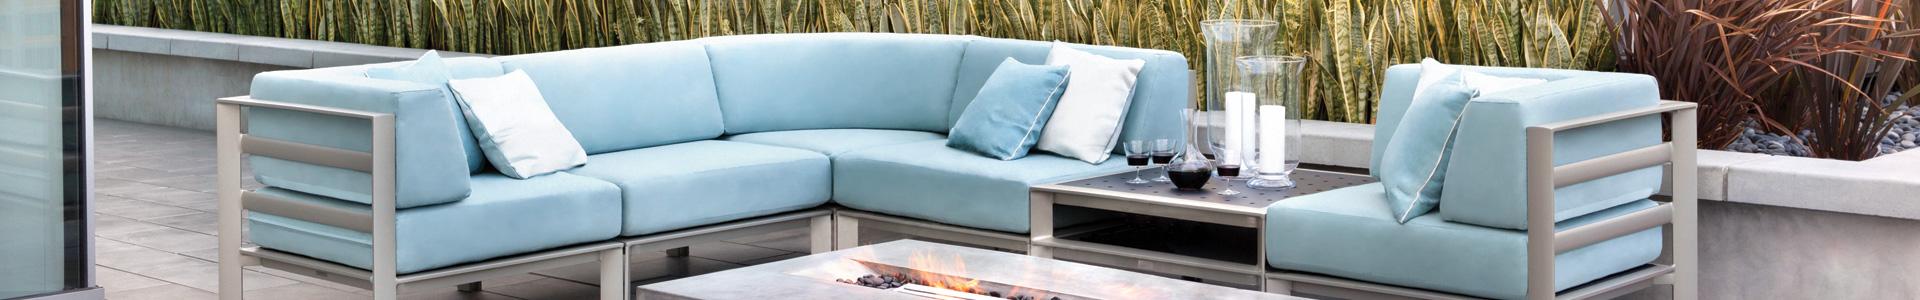 Parkway Cushion